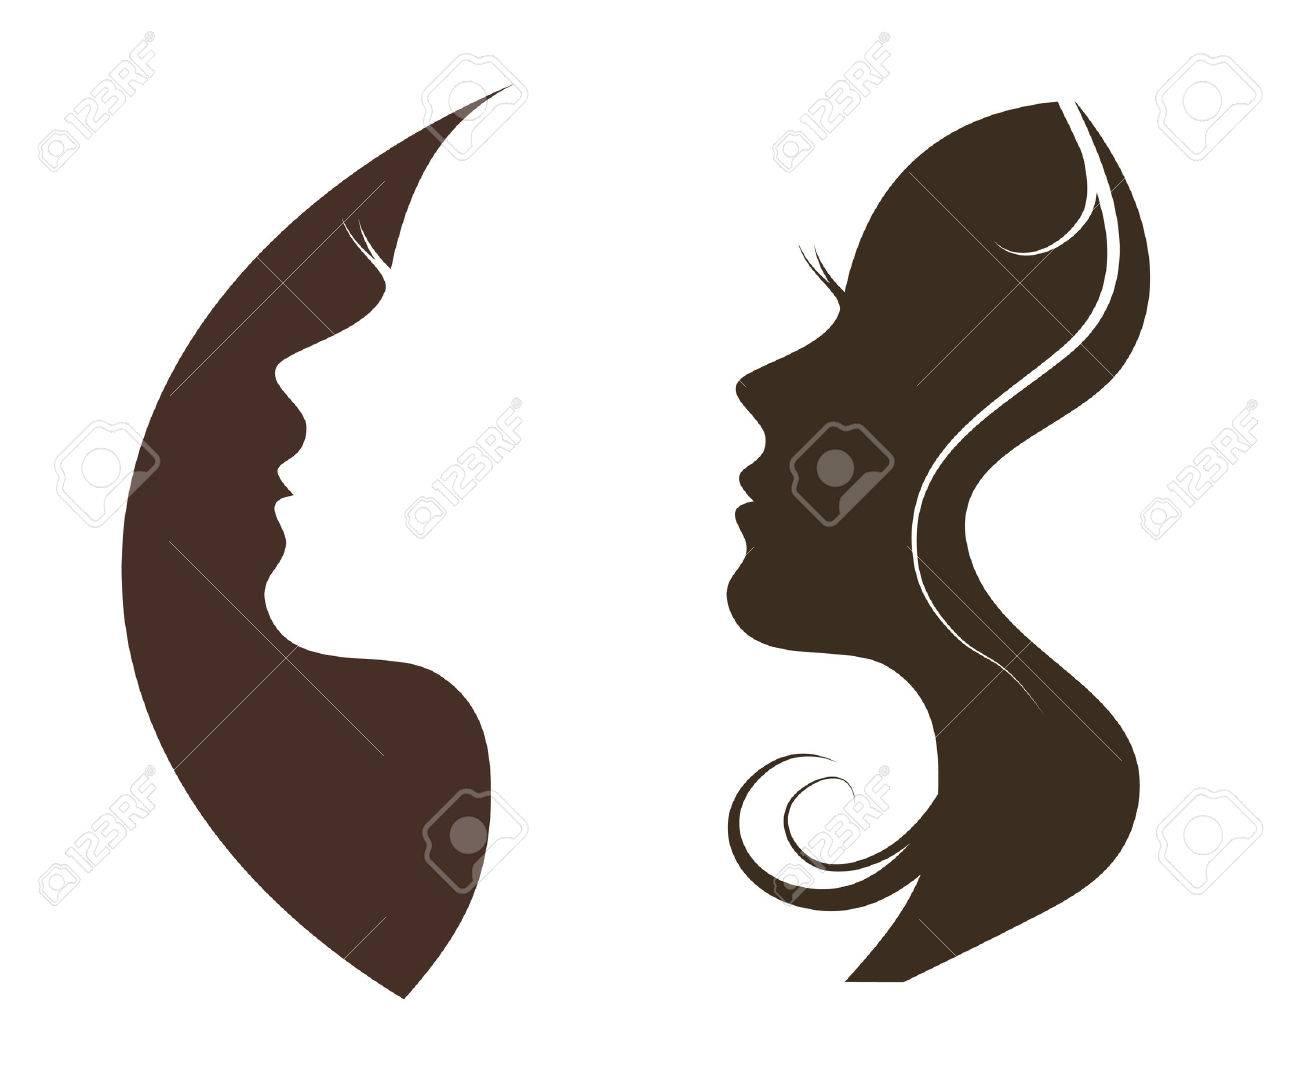 Woman chat vector logo design template. Girl silhouette - cosmetics, beauty, health; spa, fashion themes. Creative icon. - 31414881